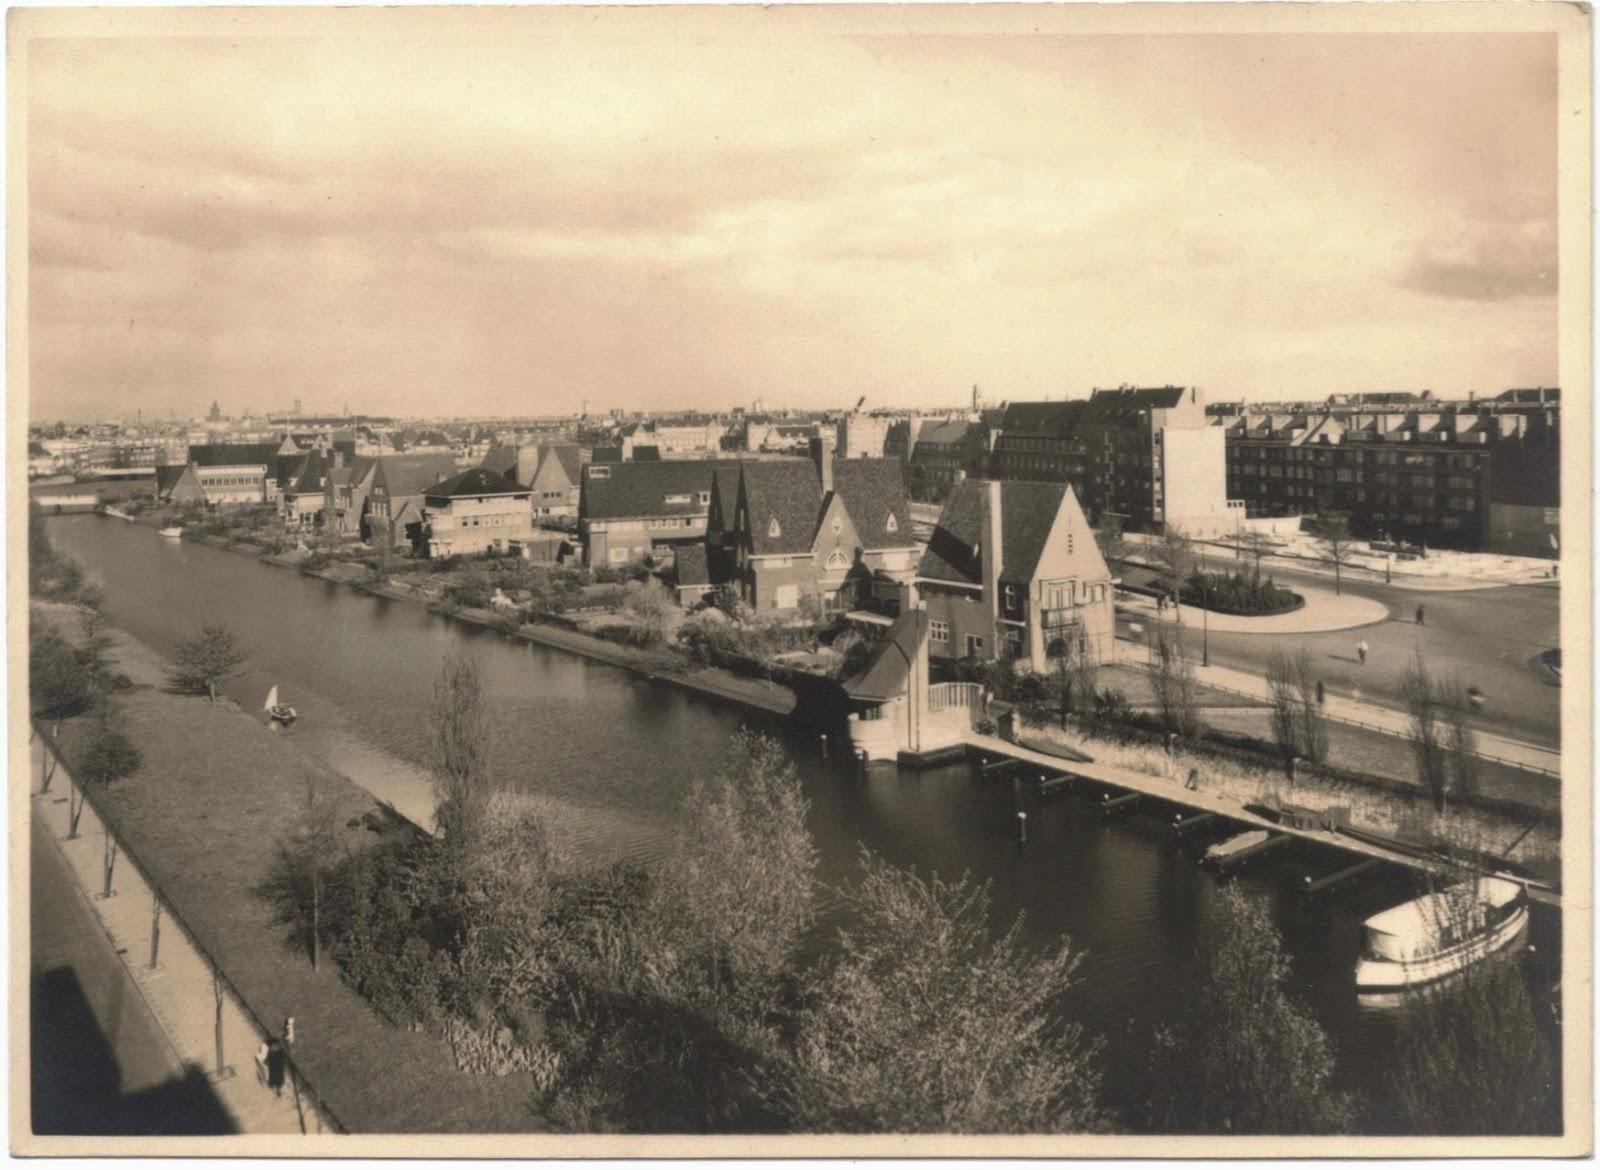 1959 Postcard of Amsterdam